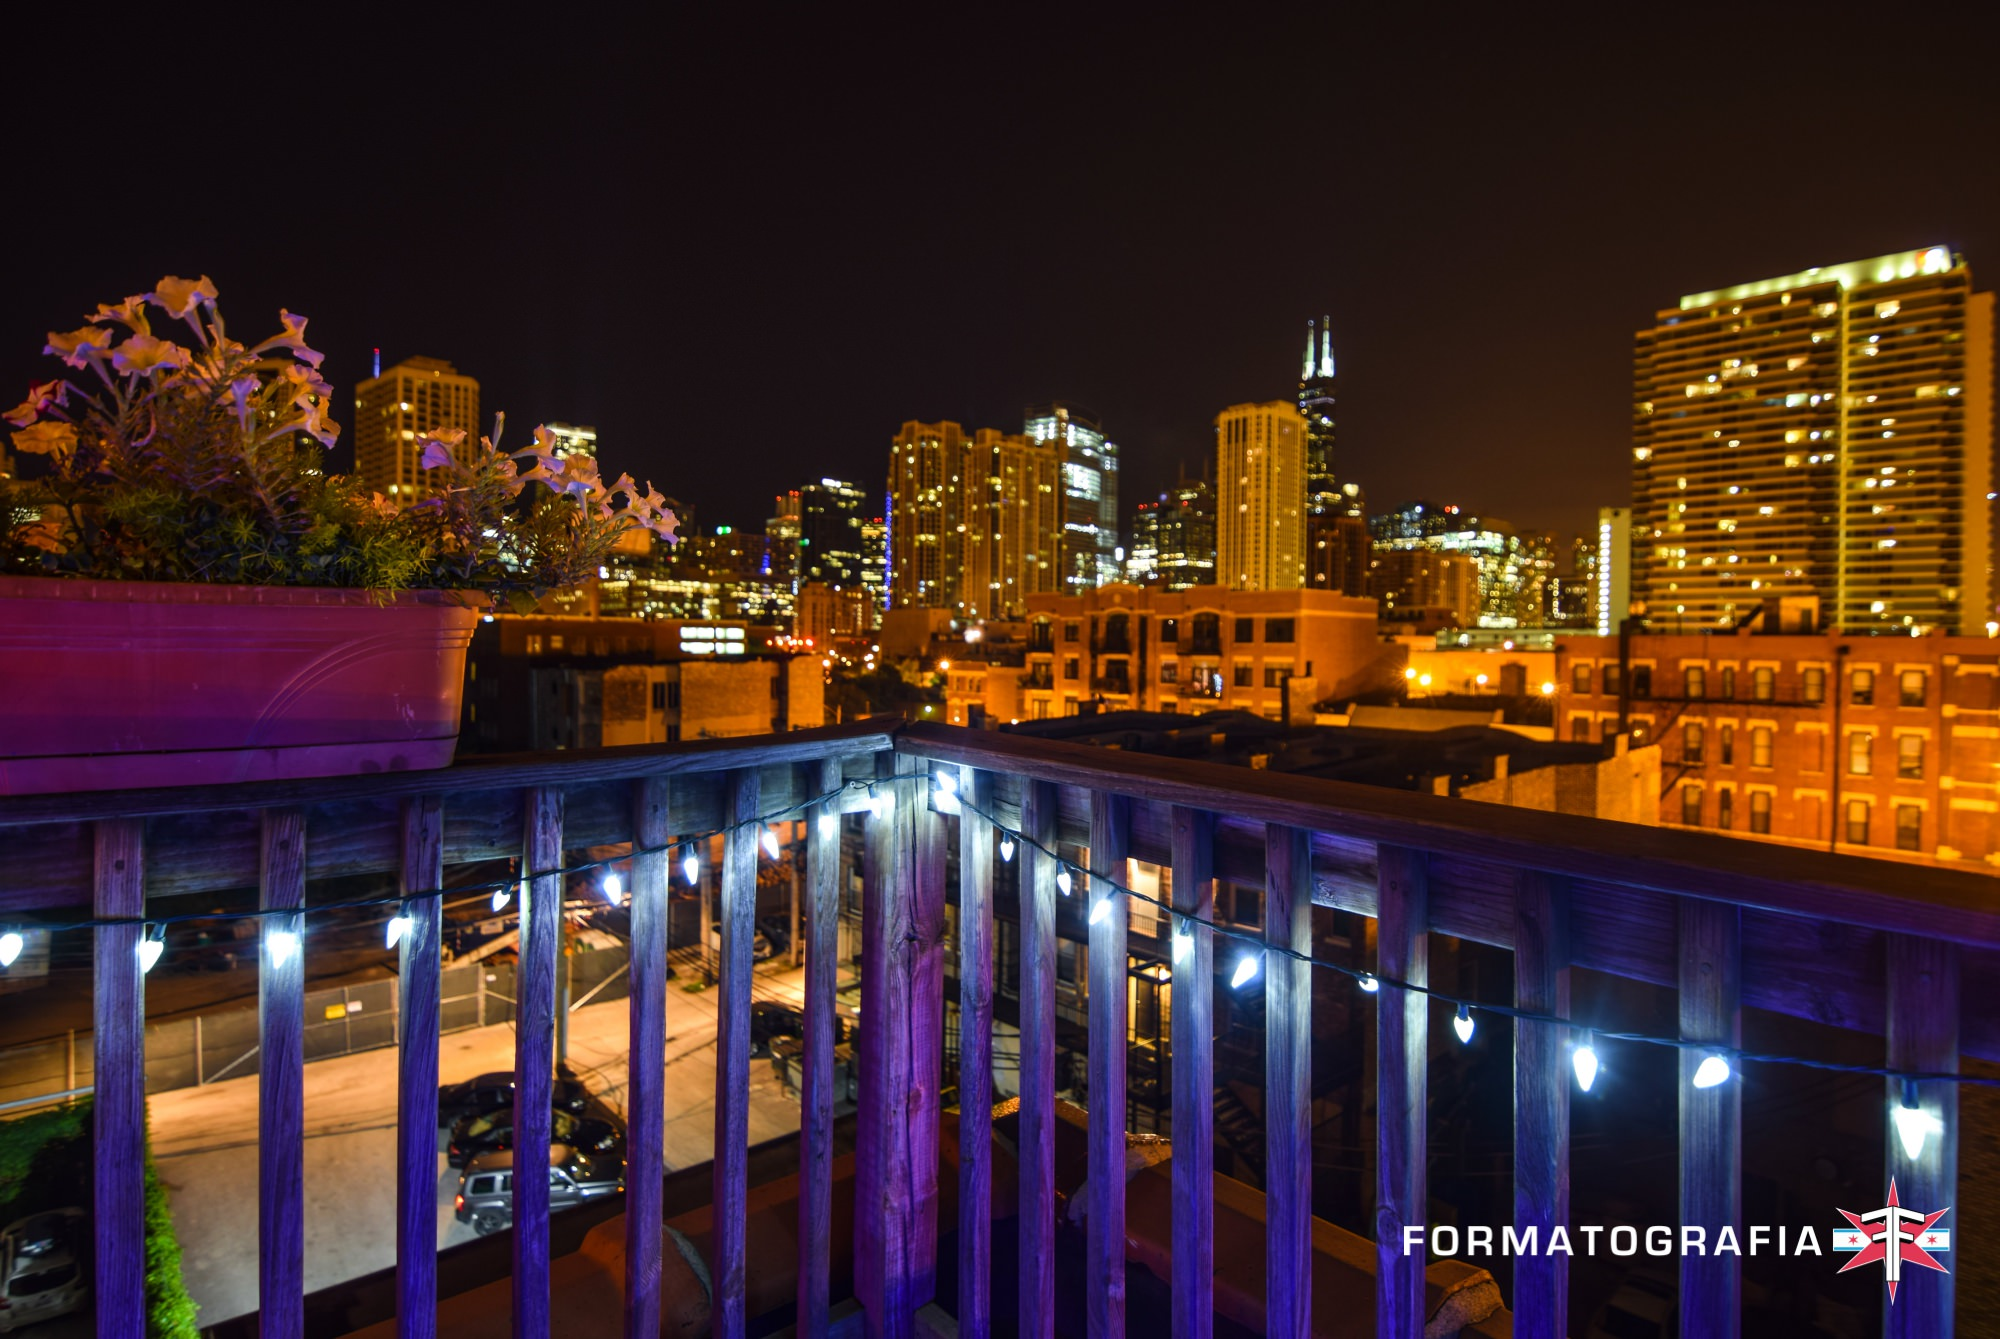 eric formato chicago photographer fall update city architecture shotsDSC_0334-2.jpg